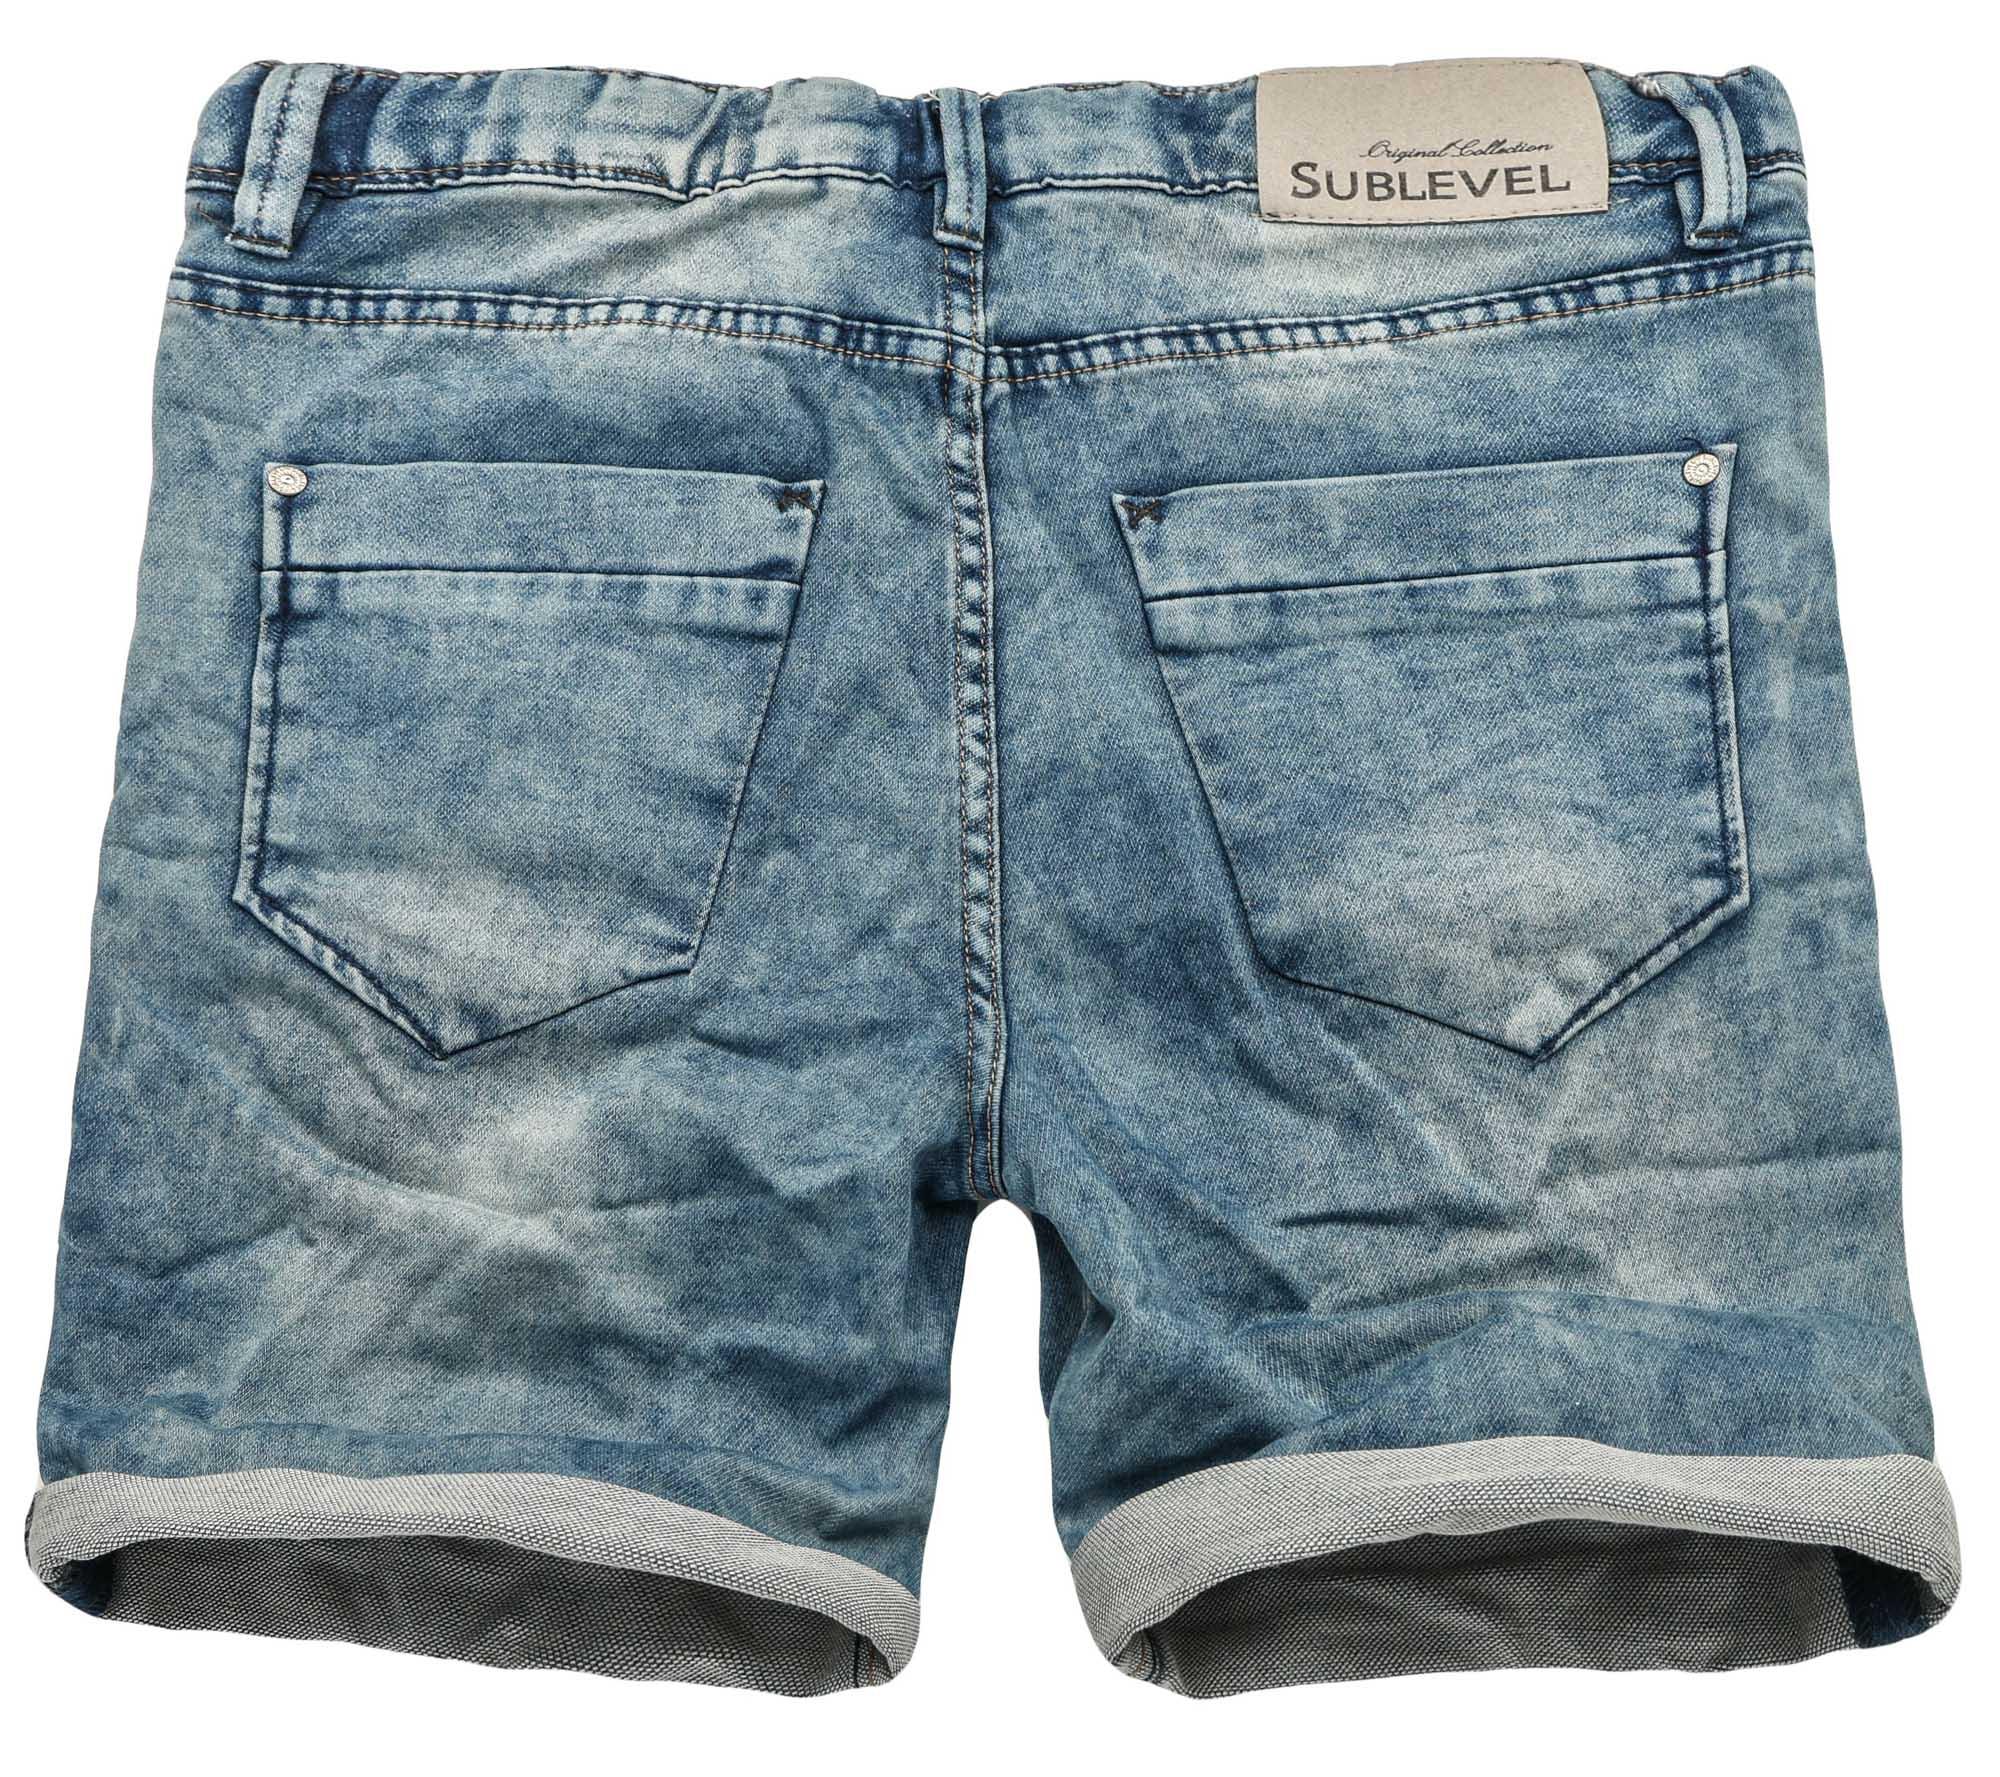 Sublevel-Herren-Sweat-Jeans-Shorts-kurze-Hose-Bermuda-Sommer-Sweathose-Slim-NEU Indexbild 31